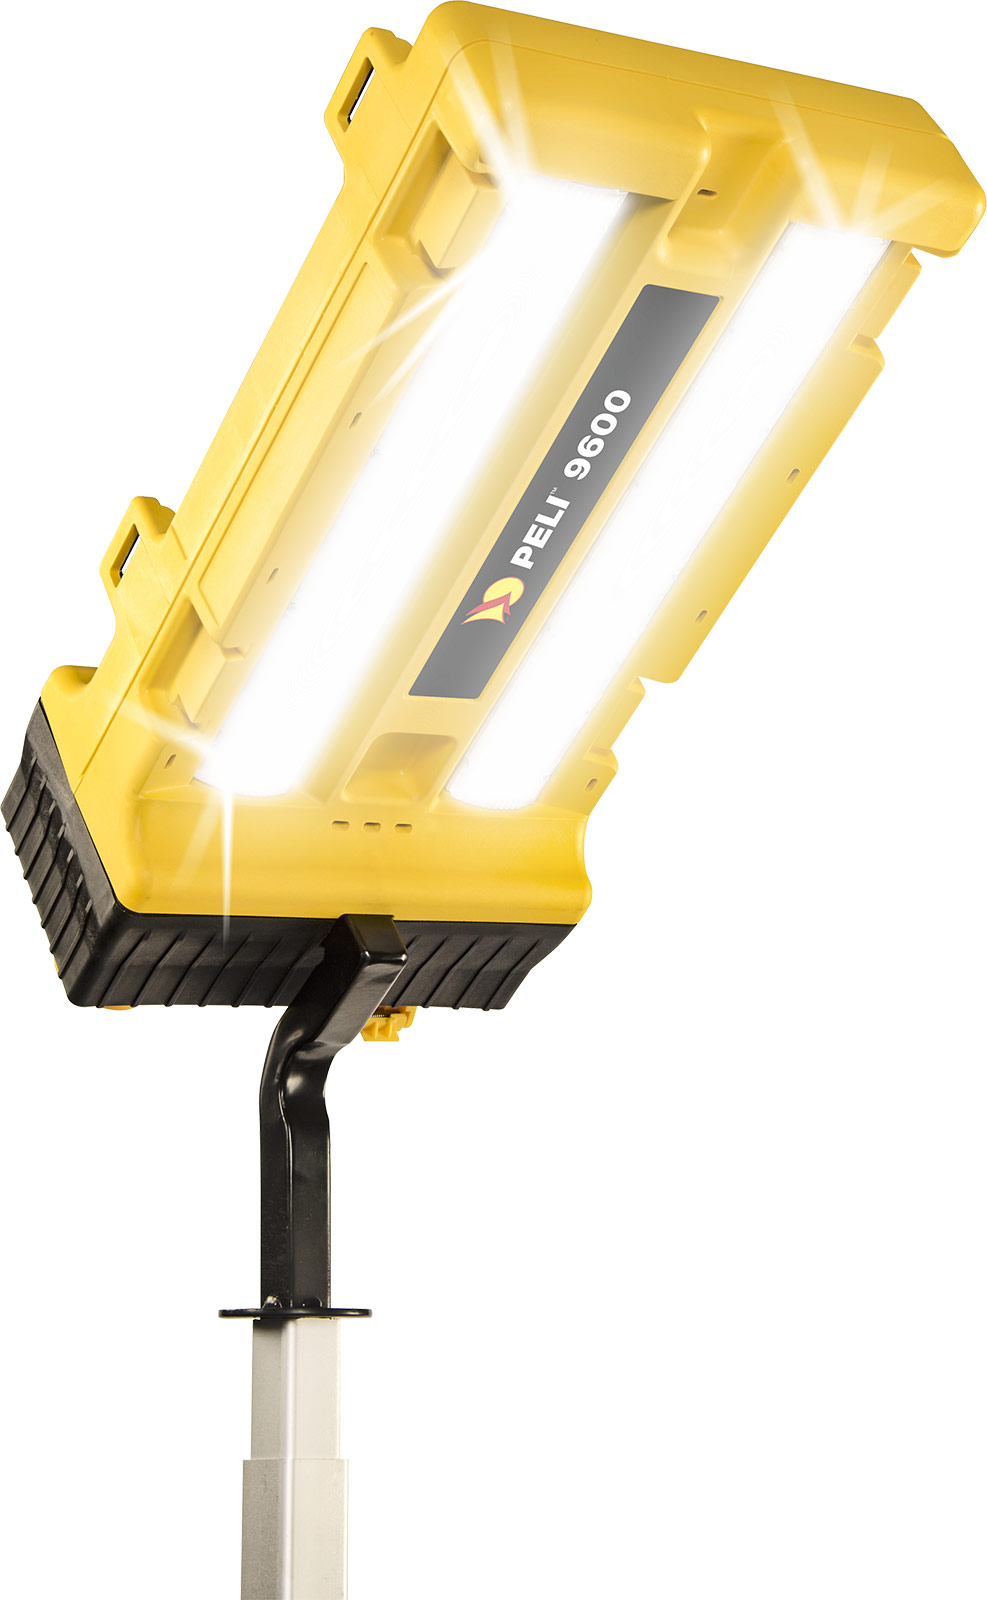 peli rals modular lighting system 9600